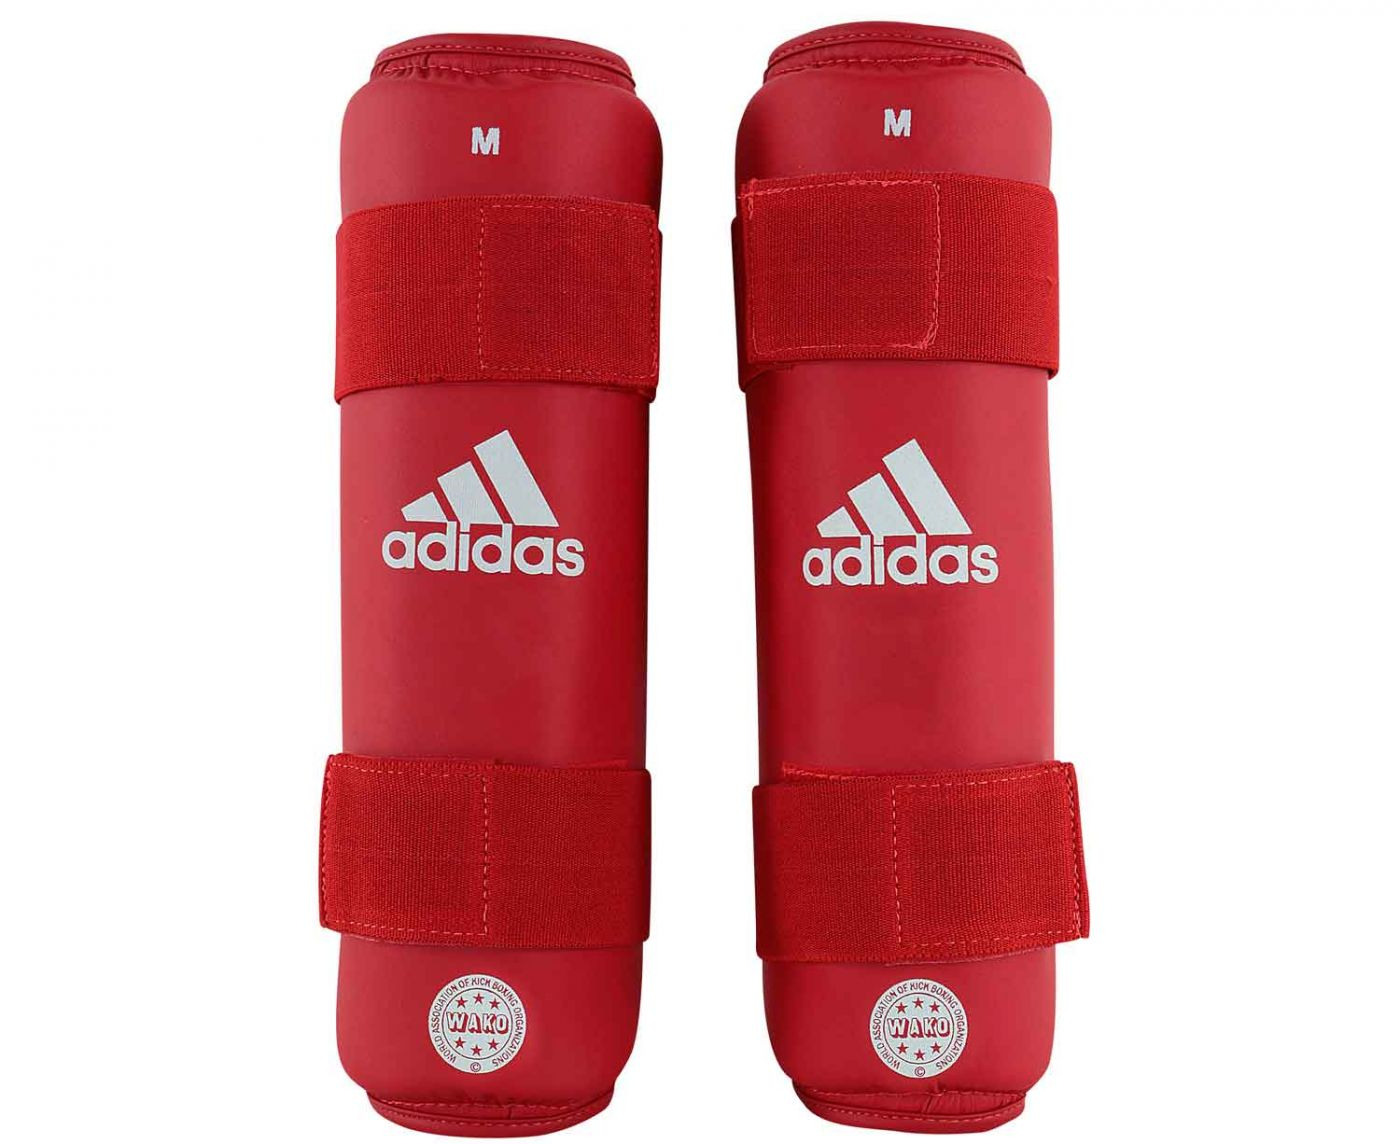 Защита голени Adidas WAKO Kickboxing Shin Guards красная, размер L, артикул adiWAKOSG01